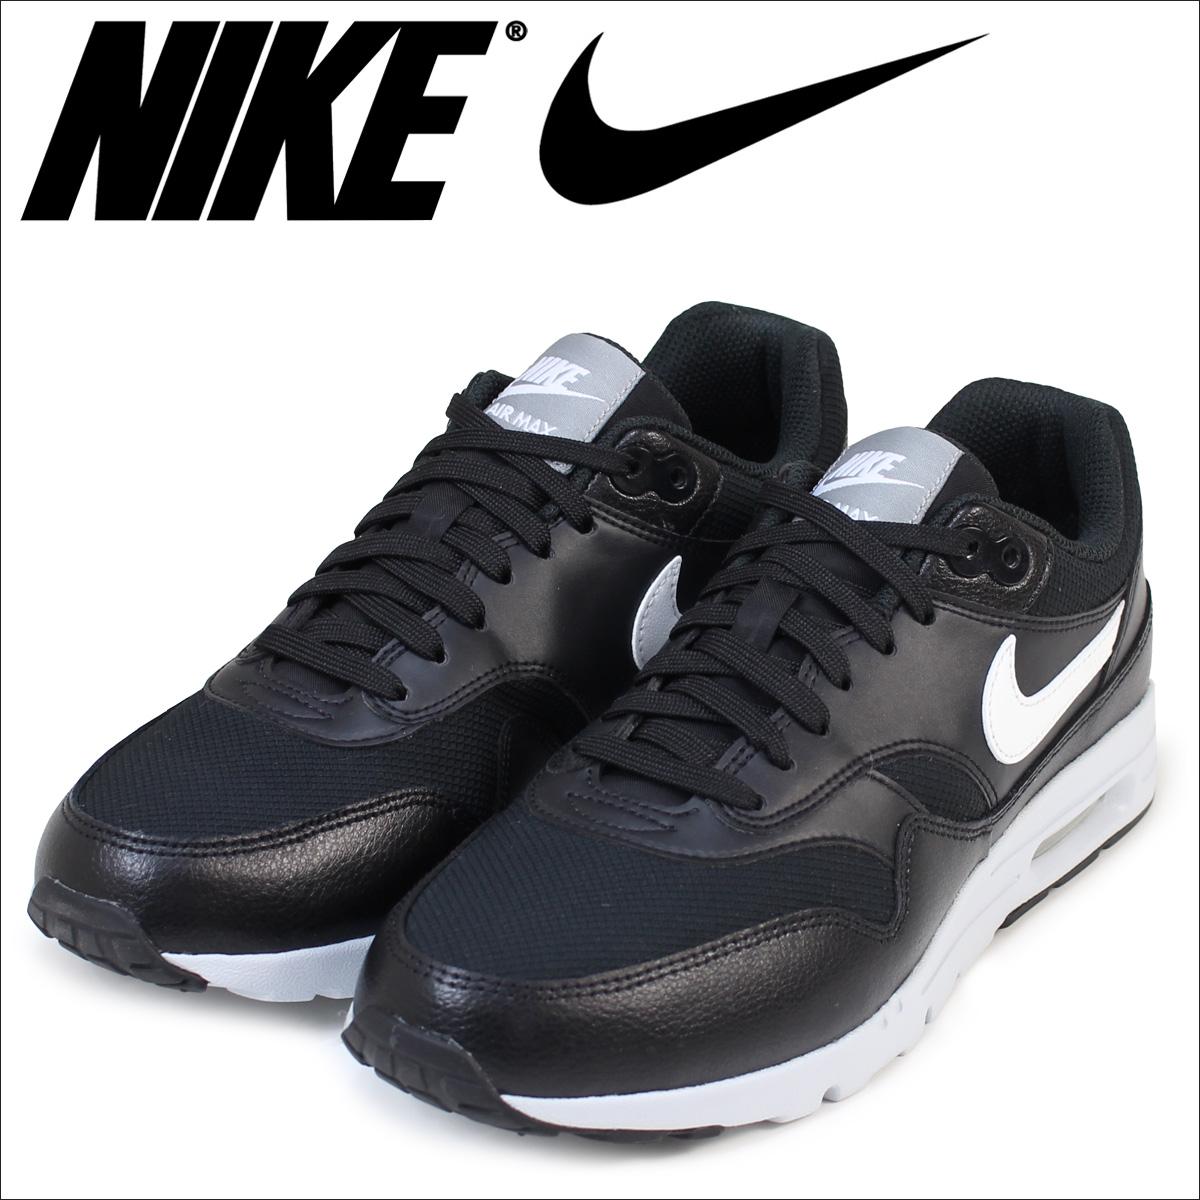 nike air max 1 ultra essential schoenen